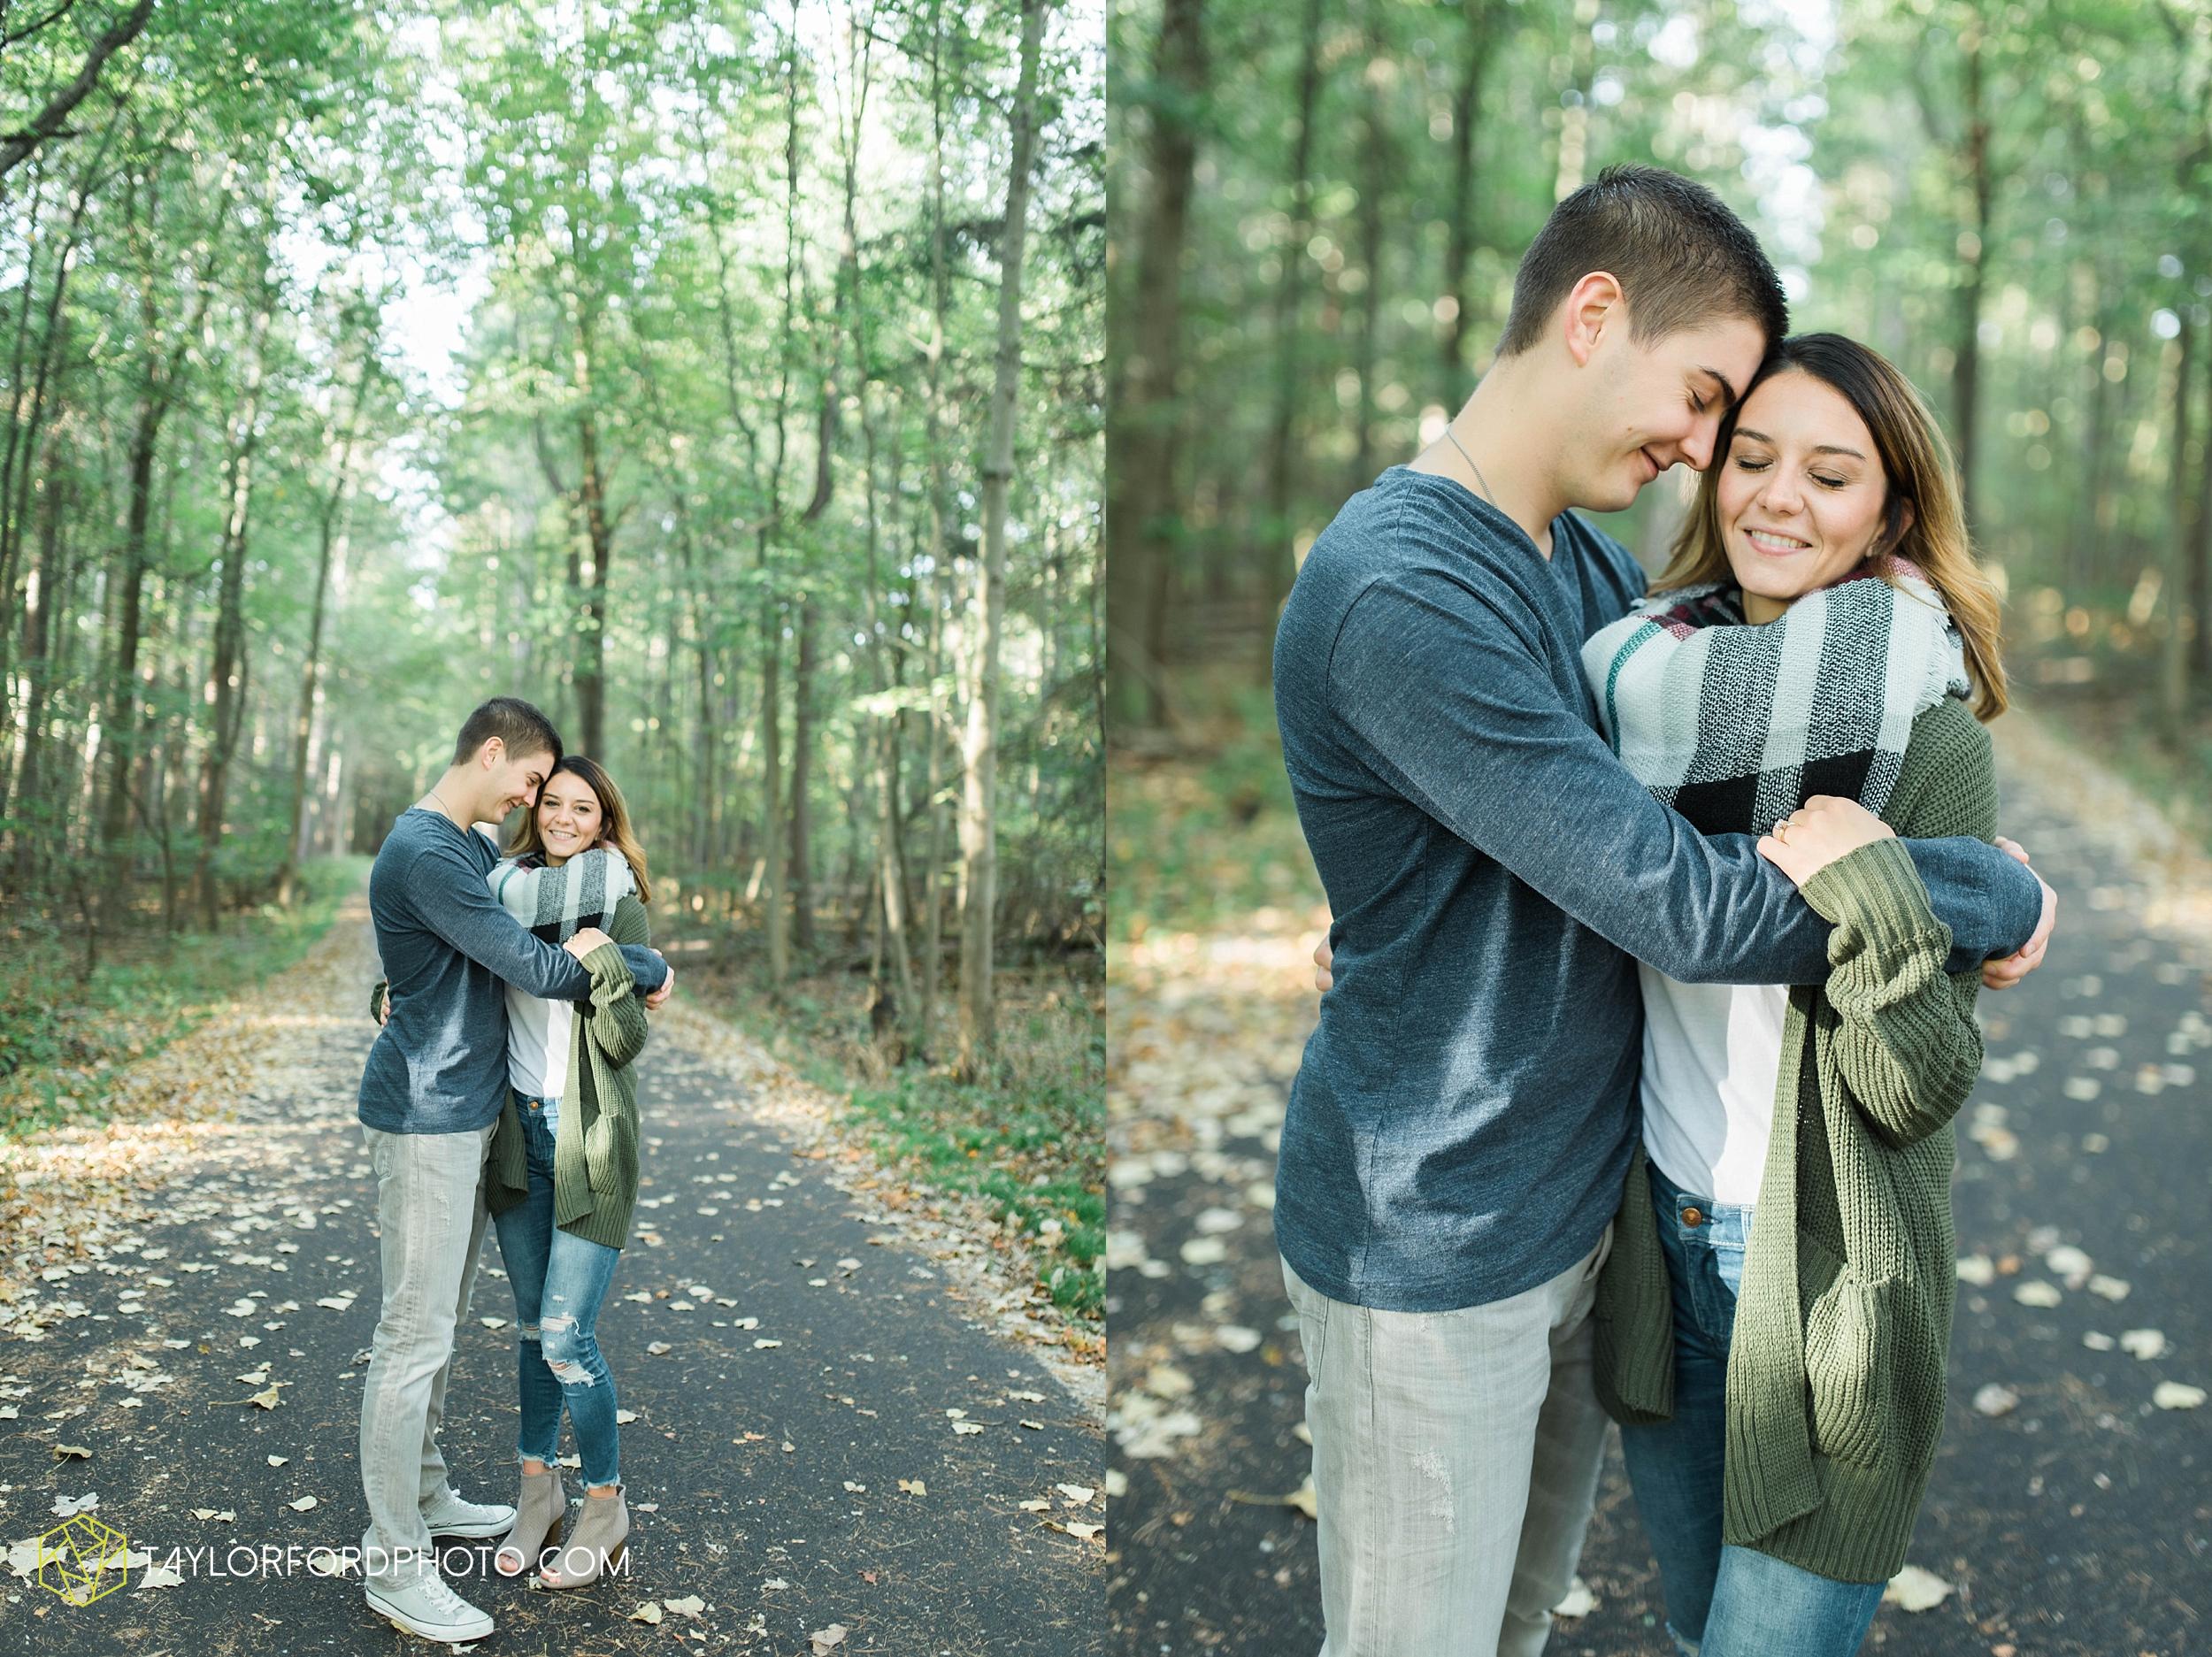 toledo-ohio-engagement-wedding-photographer-Taylor-Ford-Photography-oaks-openings-toledo-metro_3664.jpg